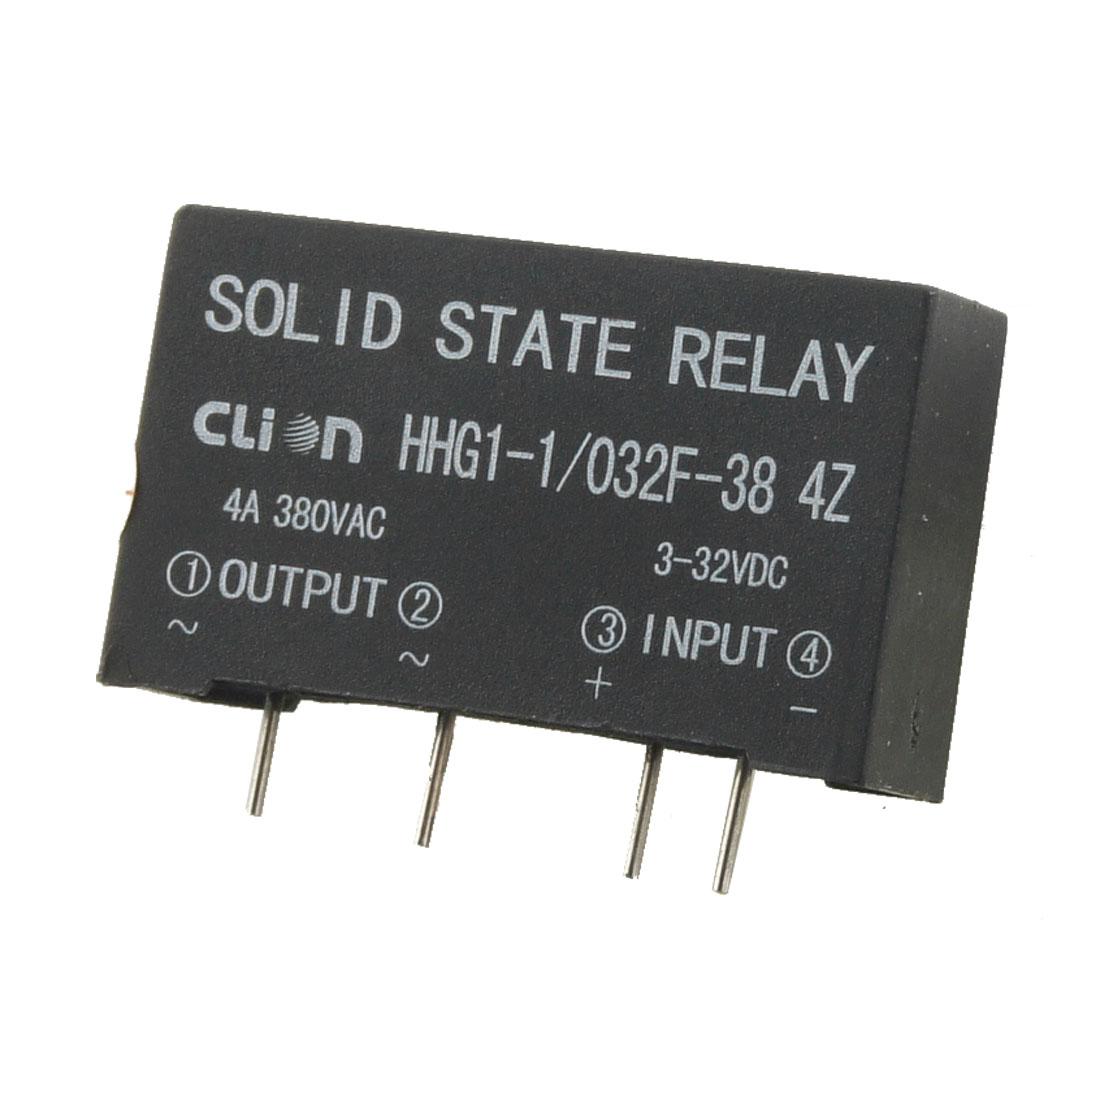 HHG1-1/032F-38 4Z in 3-32V DC Out 380V AC 4A PCB Solid State Relay